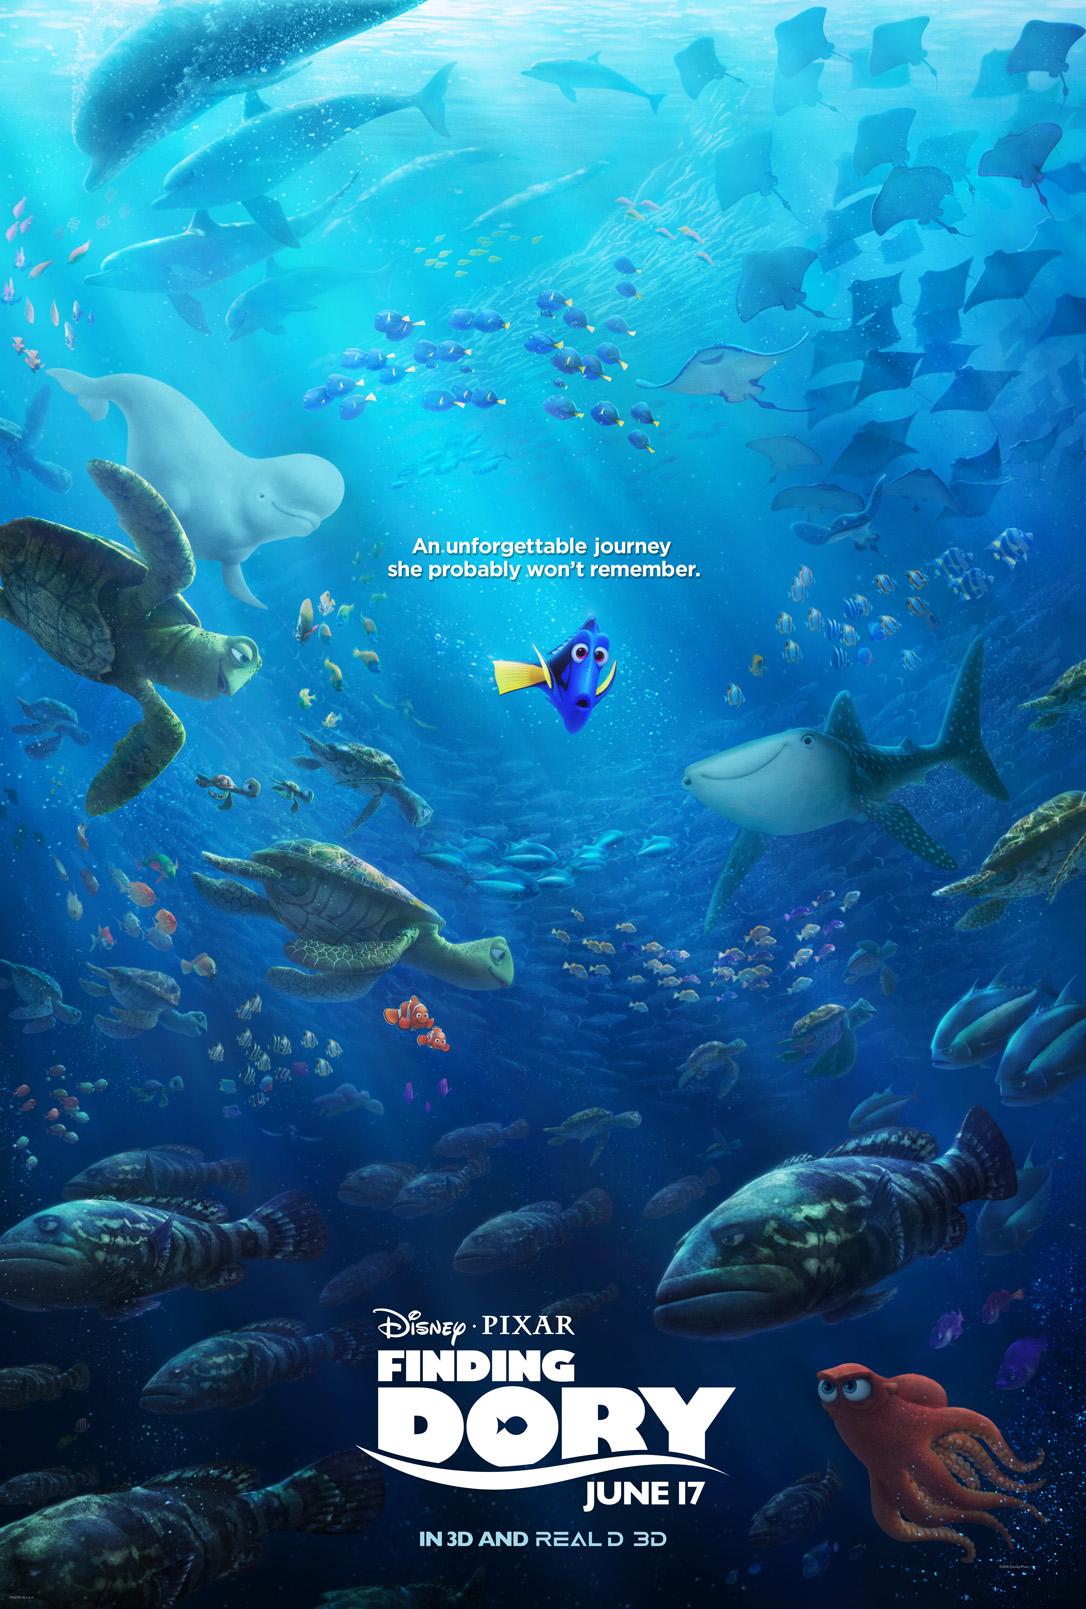 Disney//Pixar Dory Finding Dory Nemo 2-Way Ballpoint Pen 2 Colors Black /& Red Ink